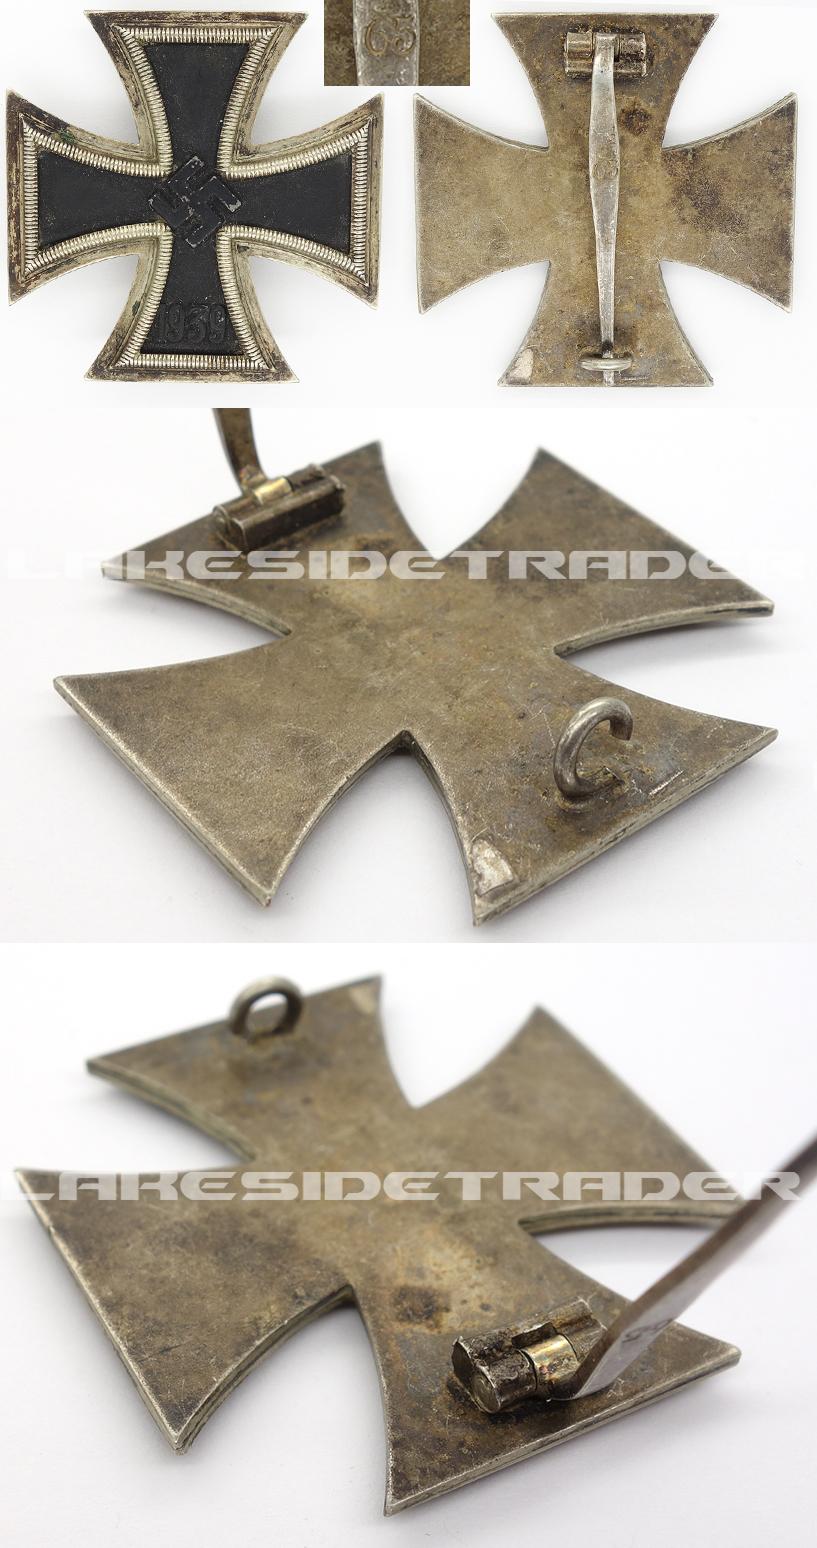 1st Class Iron Cross by K&Q